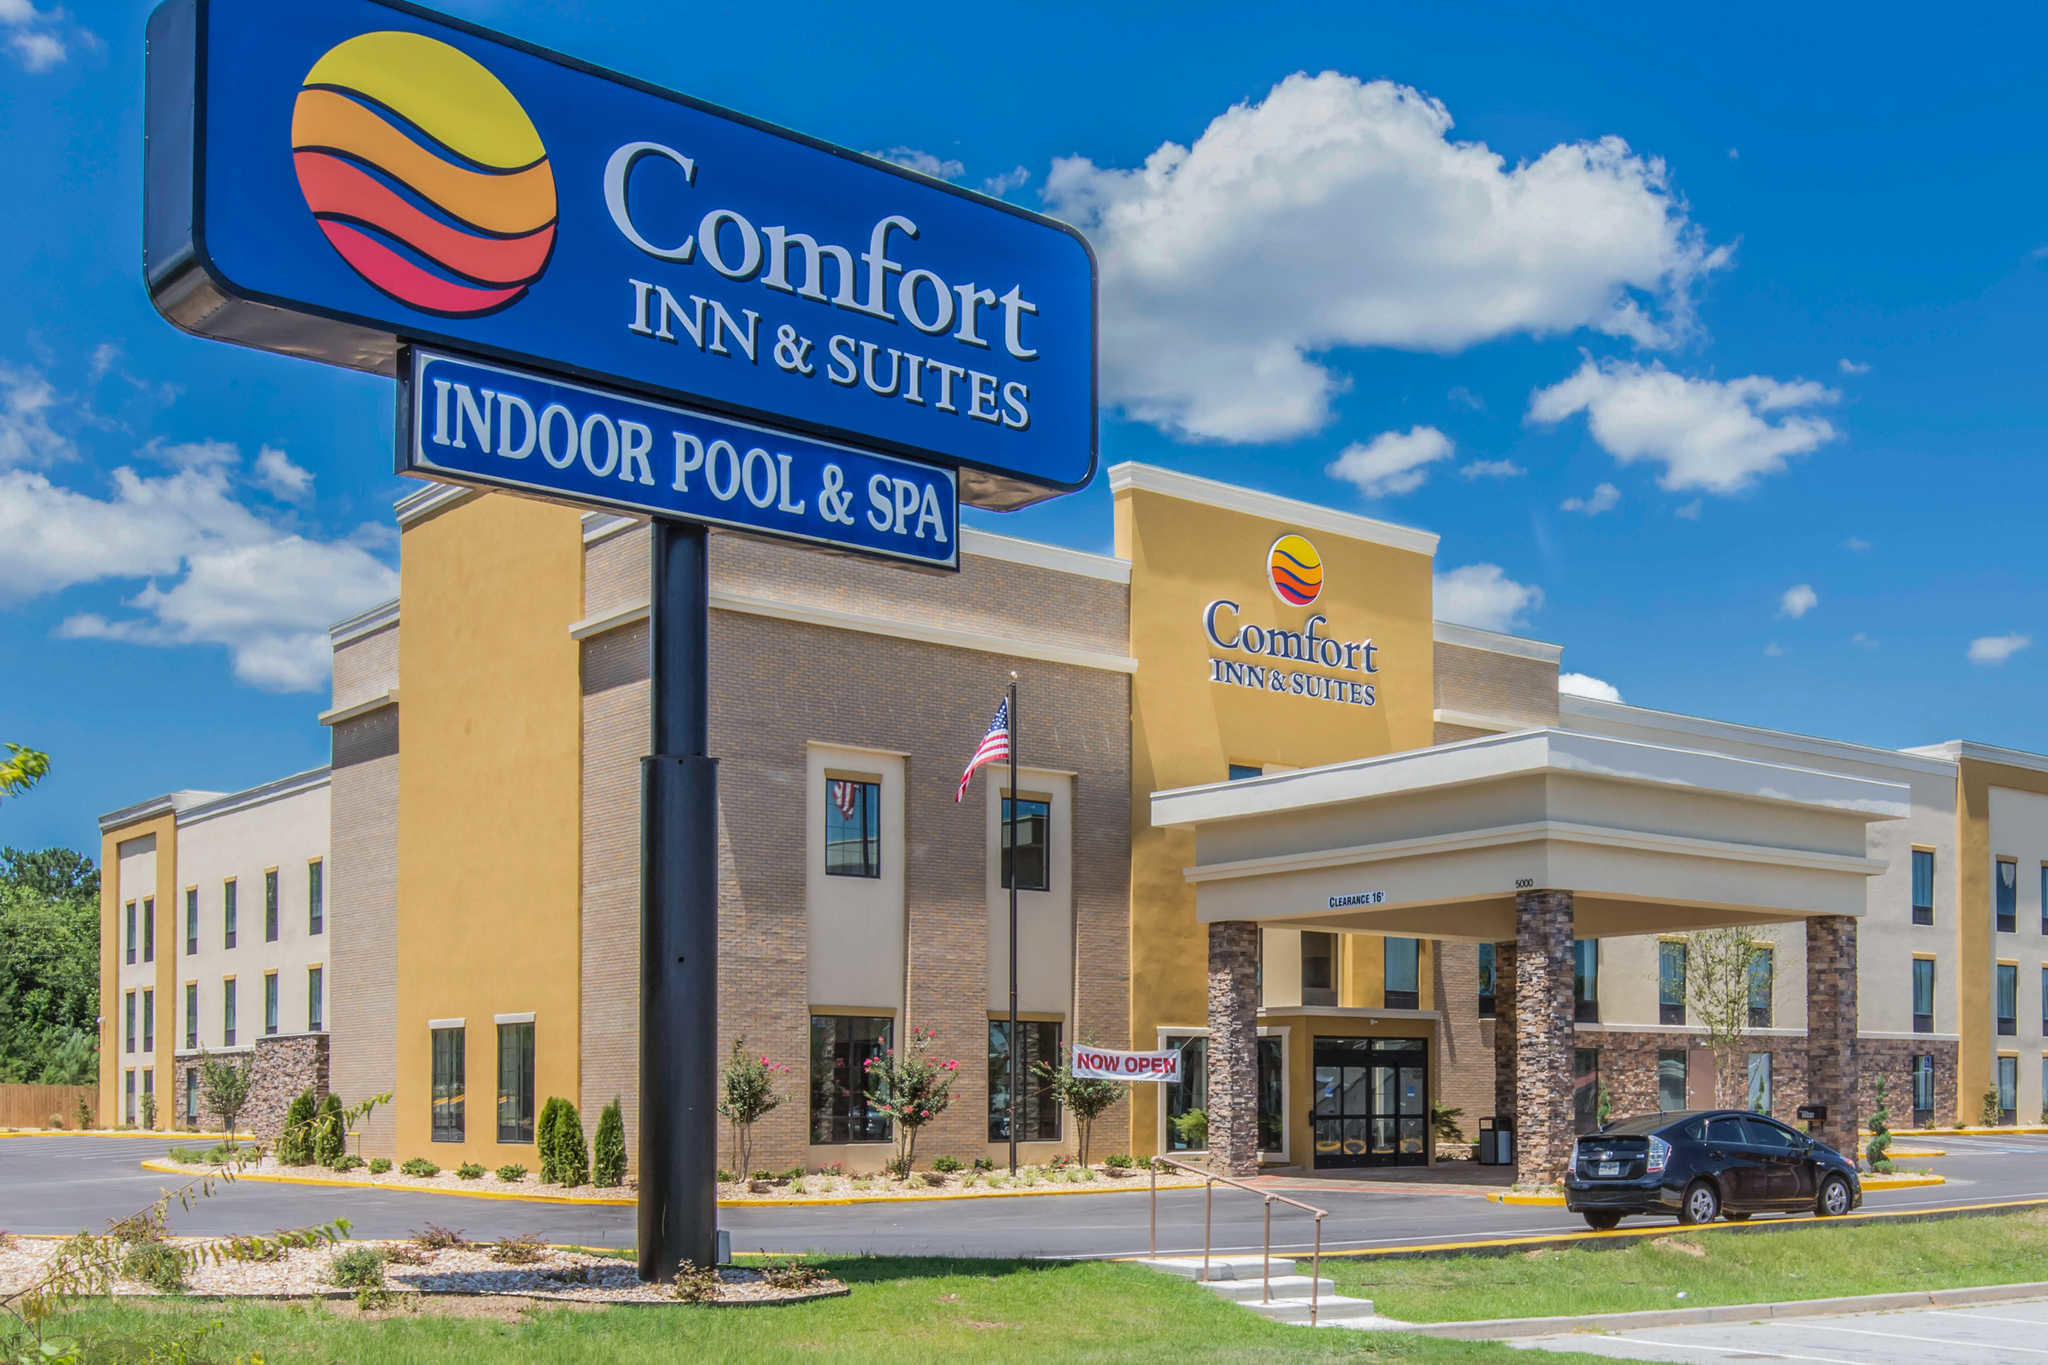 Comfort Inn & Suites West image 1